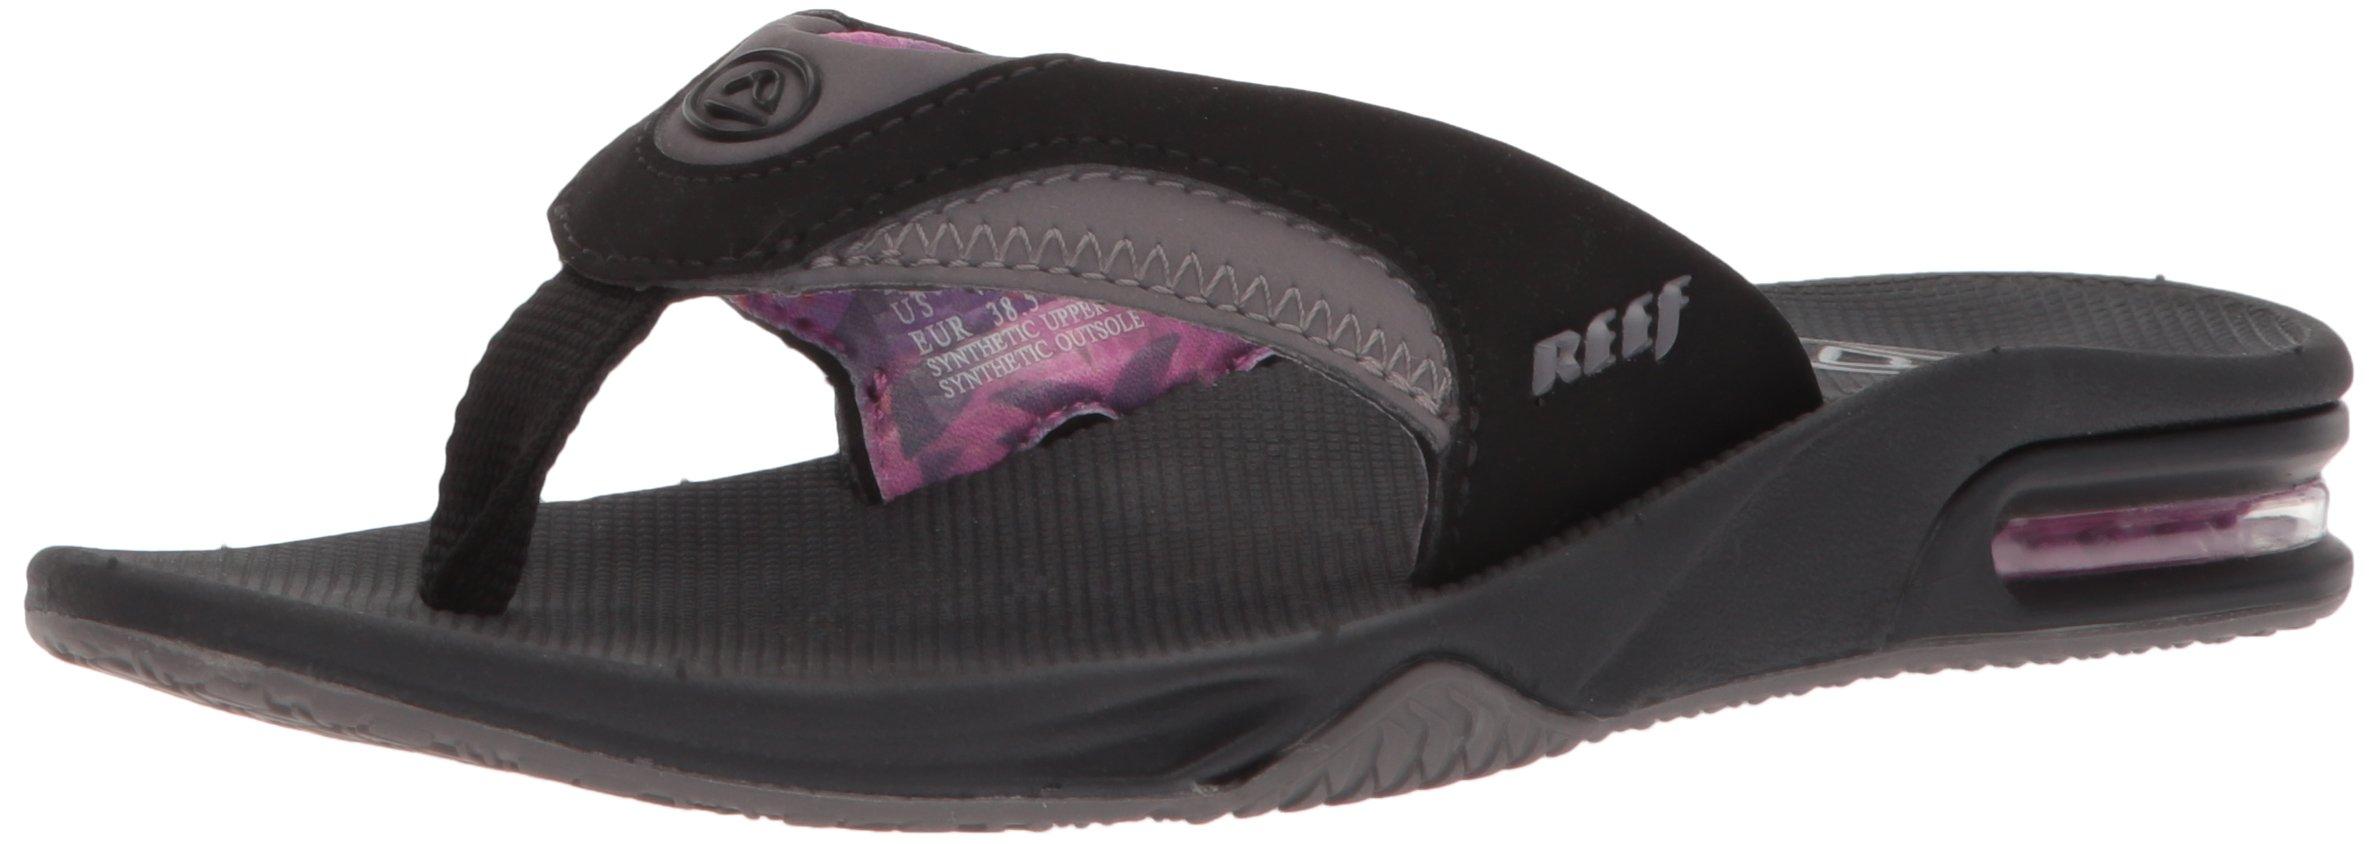 Reef Women's Fanning Sandal, Black/Grey, 9 M US